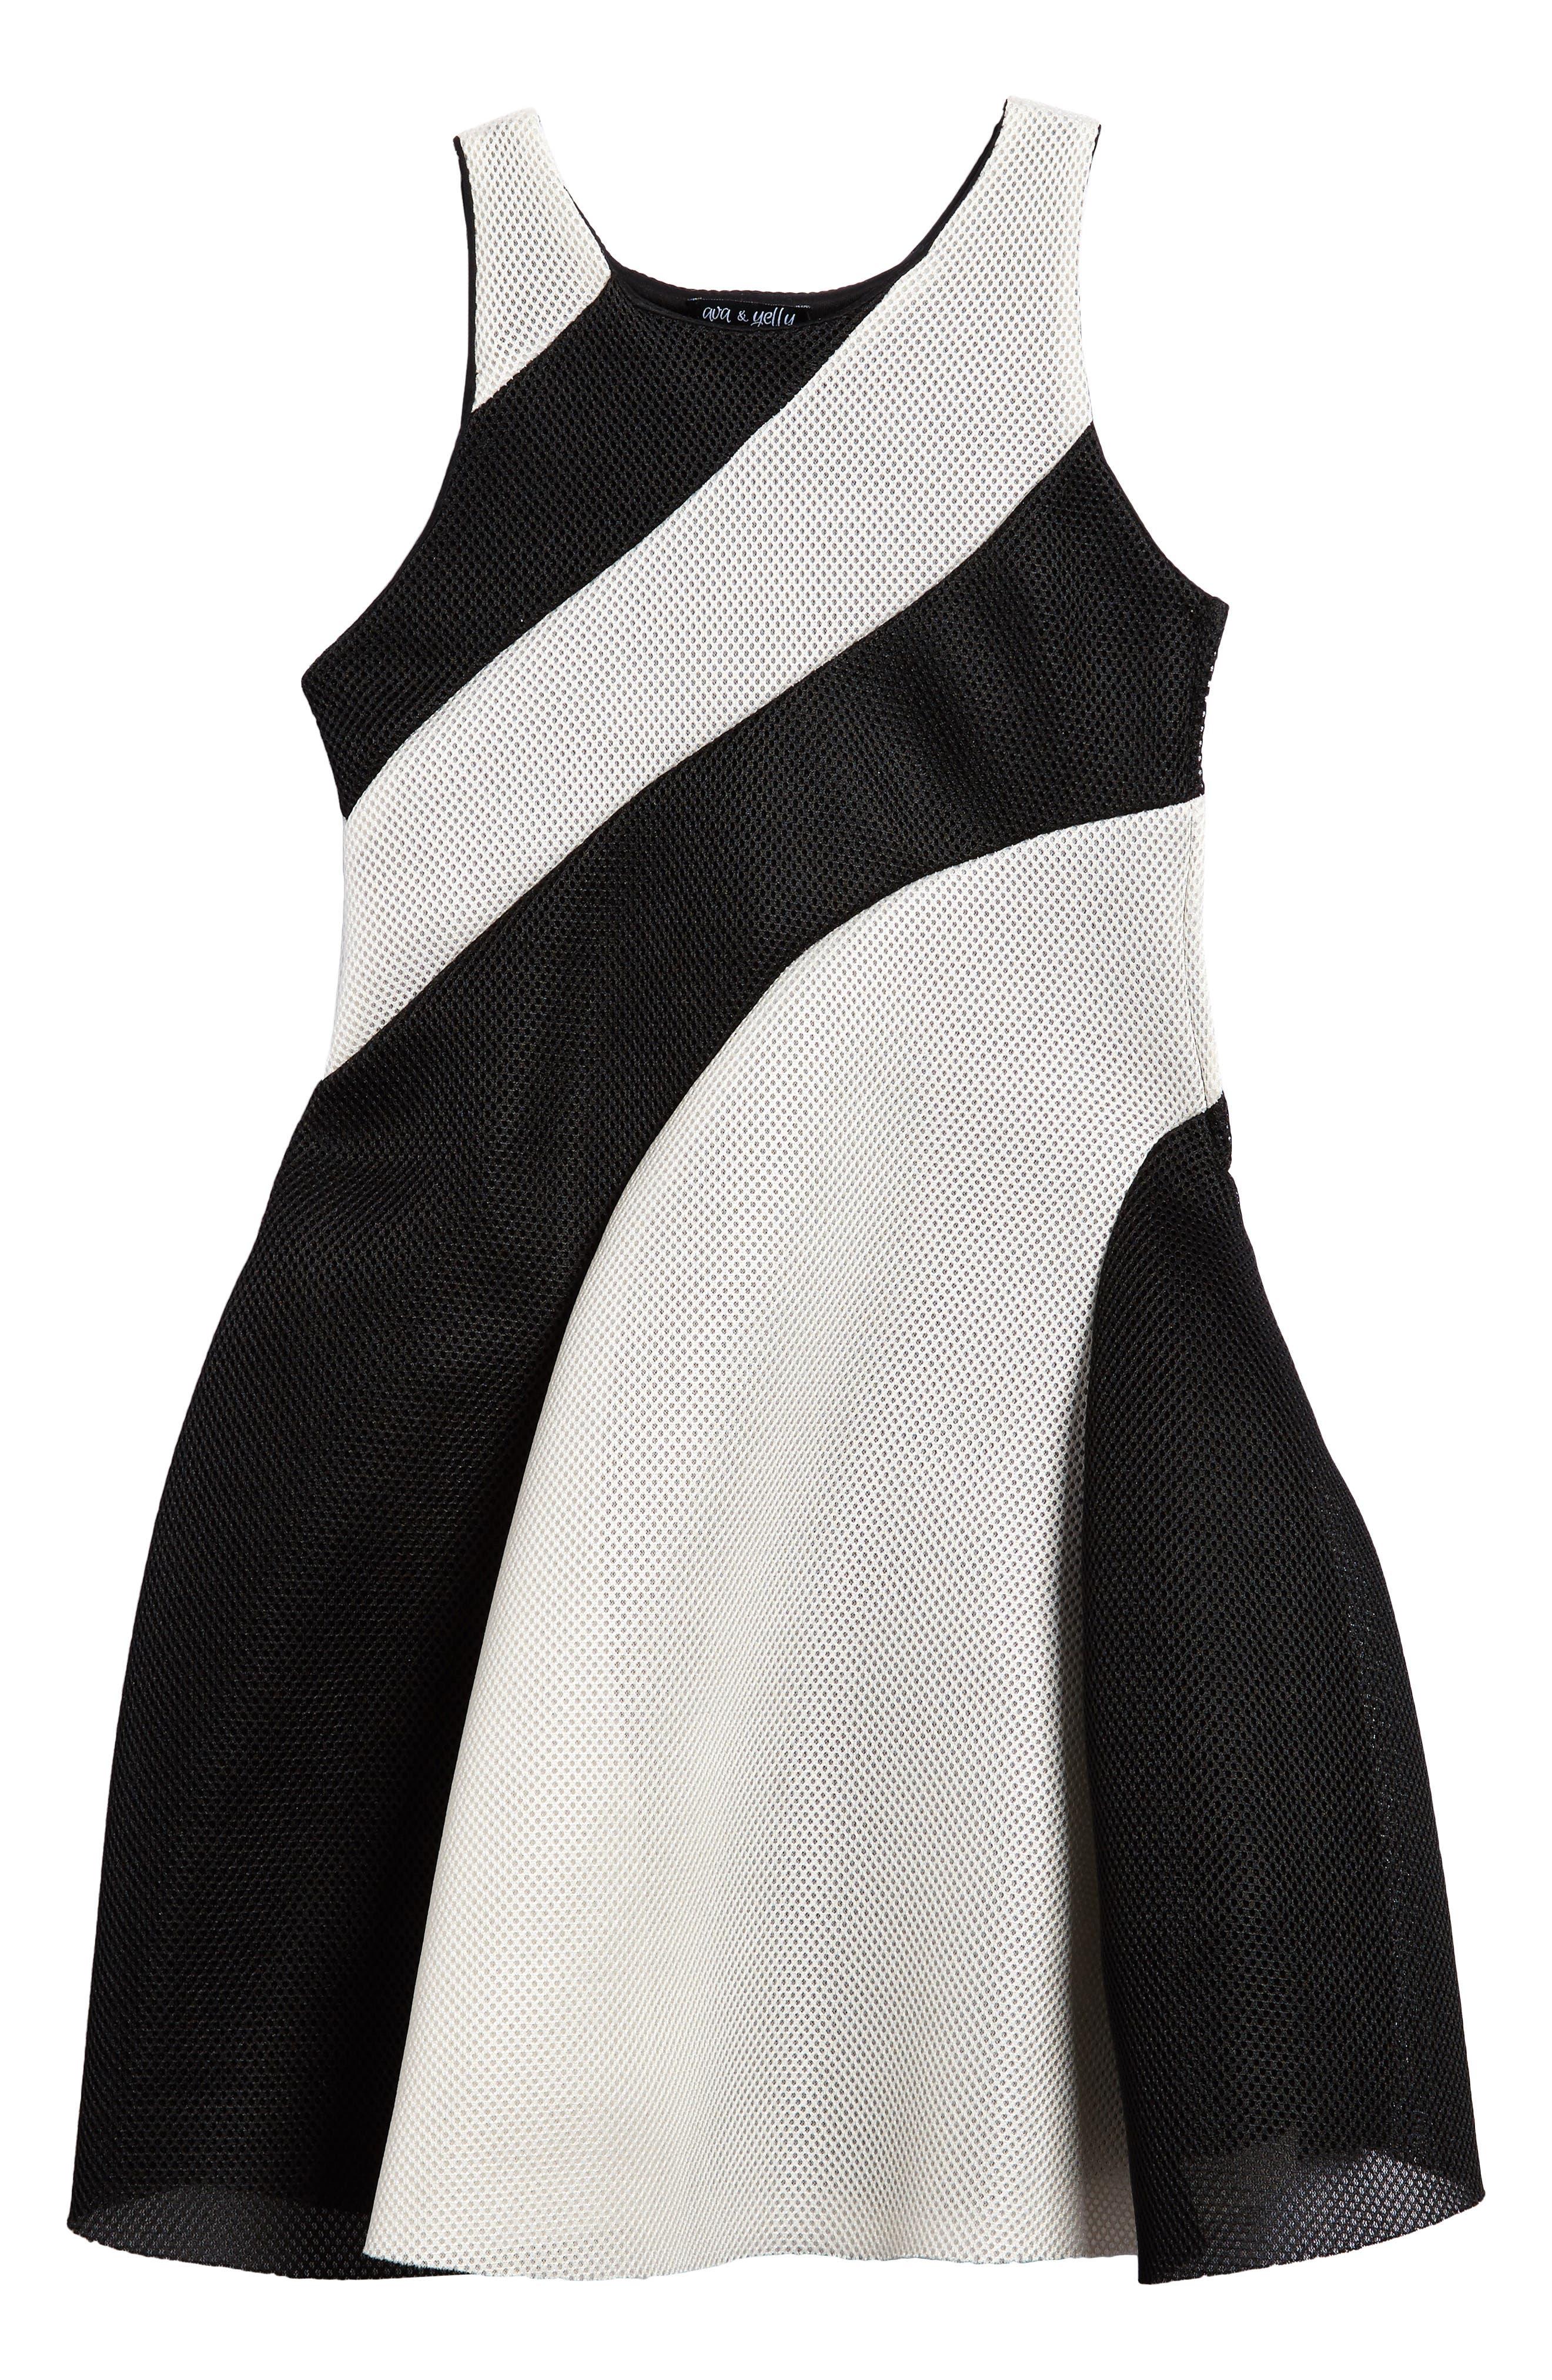 Techno Mesh Skater Dress,                             Main thumbnail 1, color,                             001